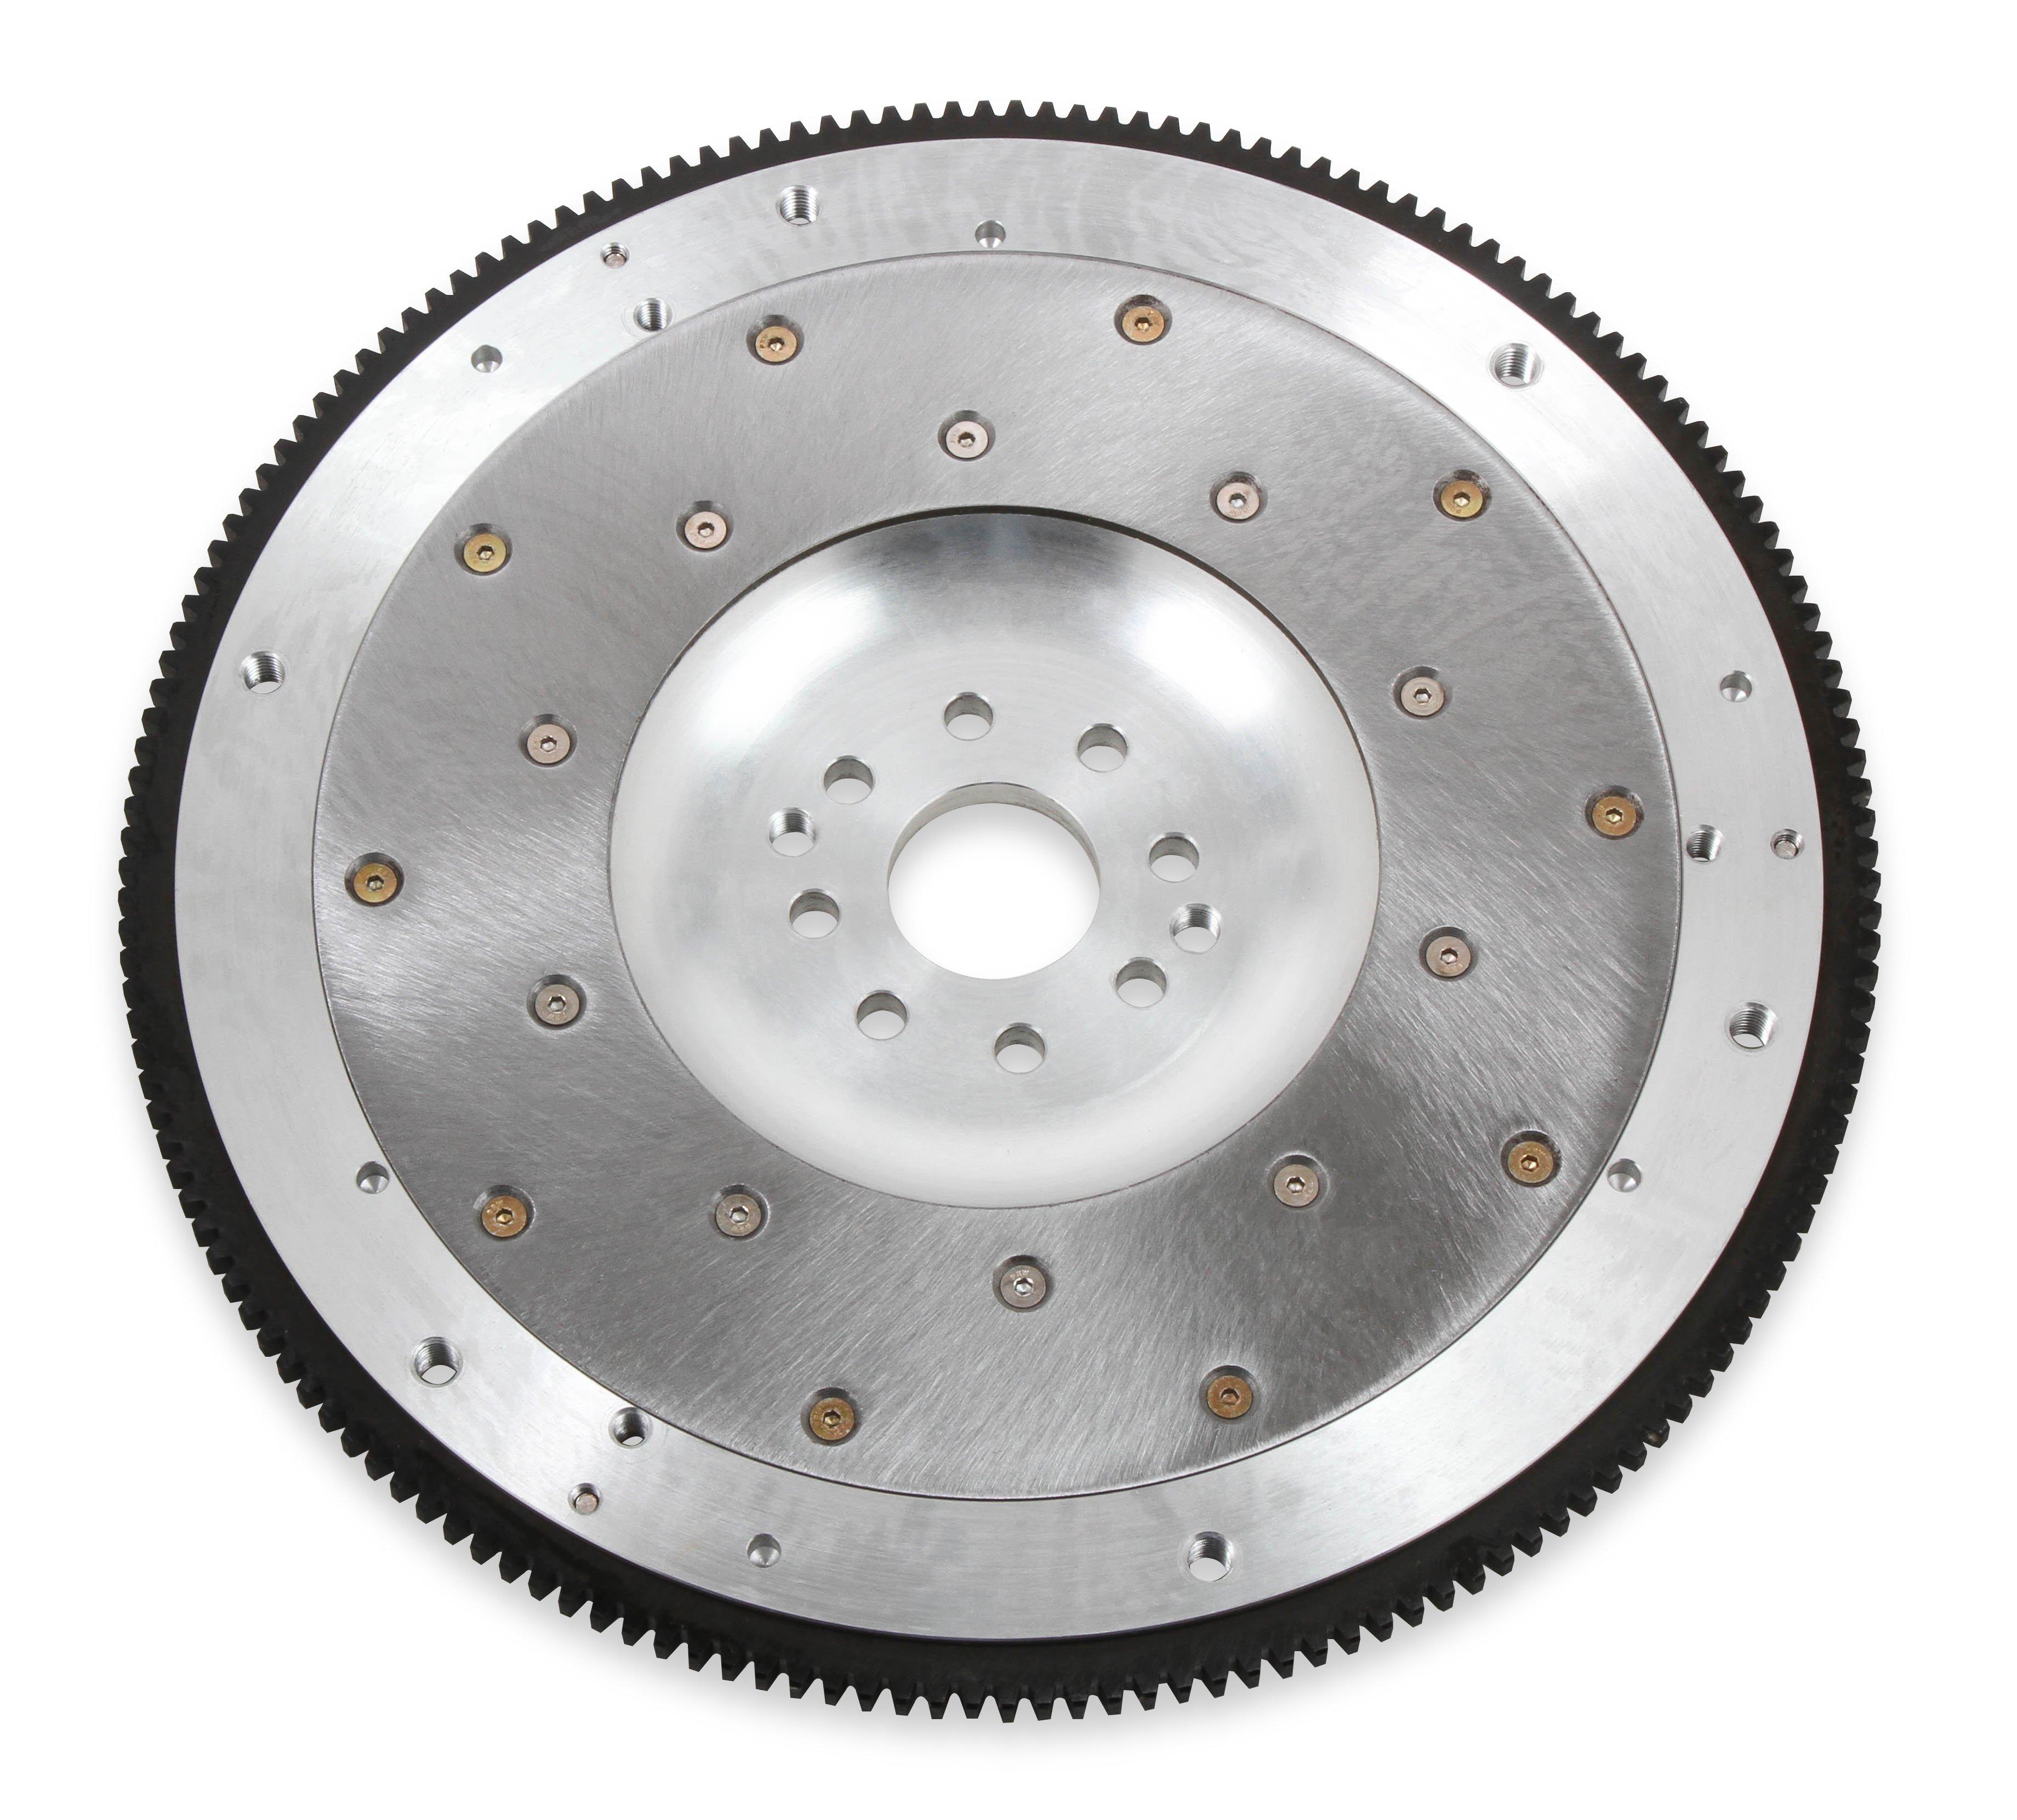 Hays 22-835 Hays Billet Aluminum SFI Approved Flywheel